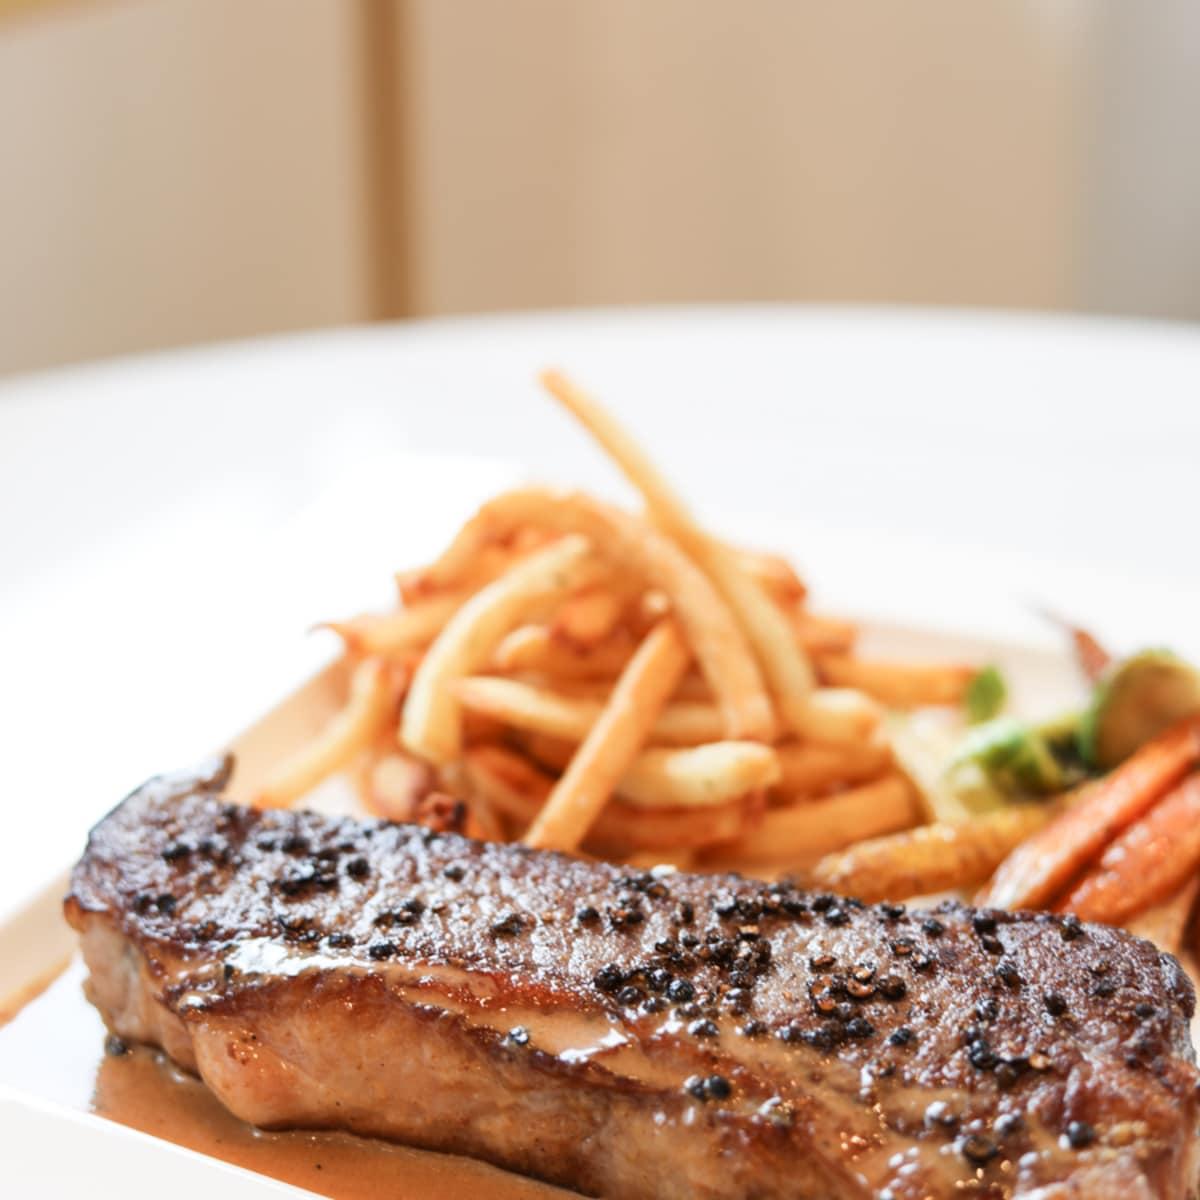 Bisou steak au poivre